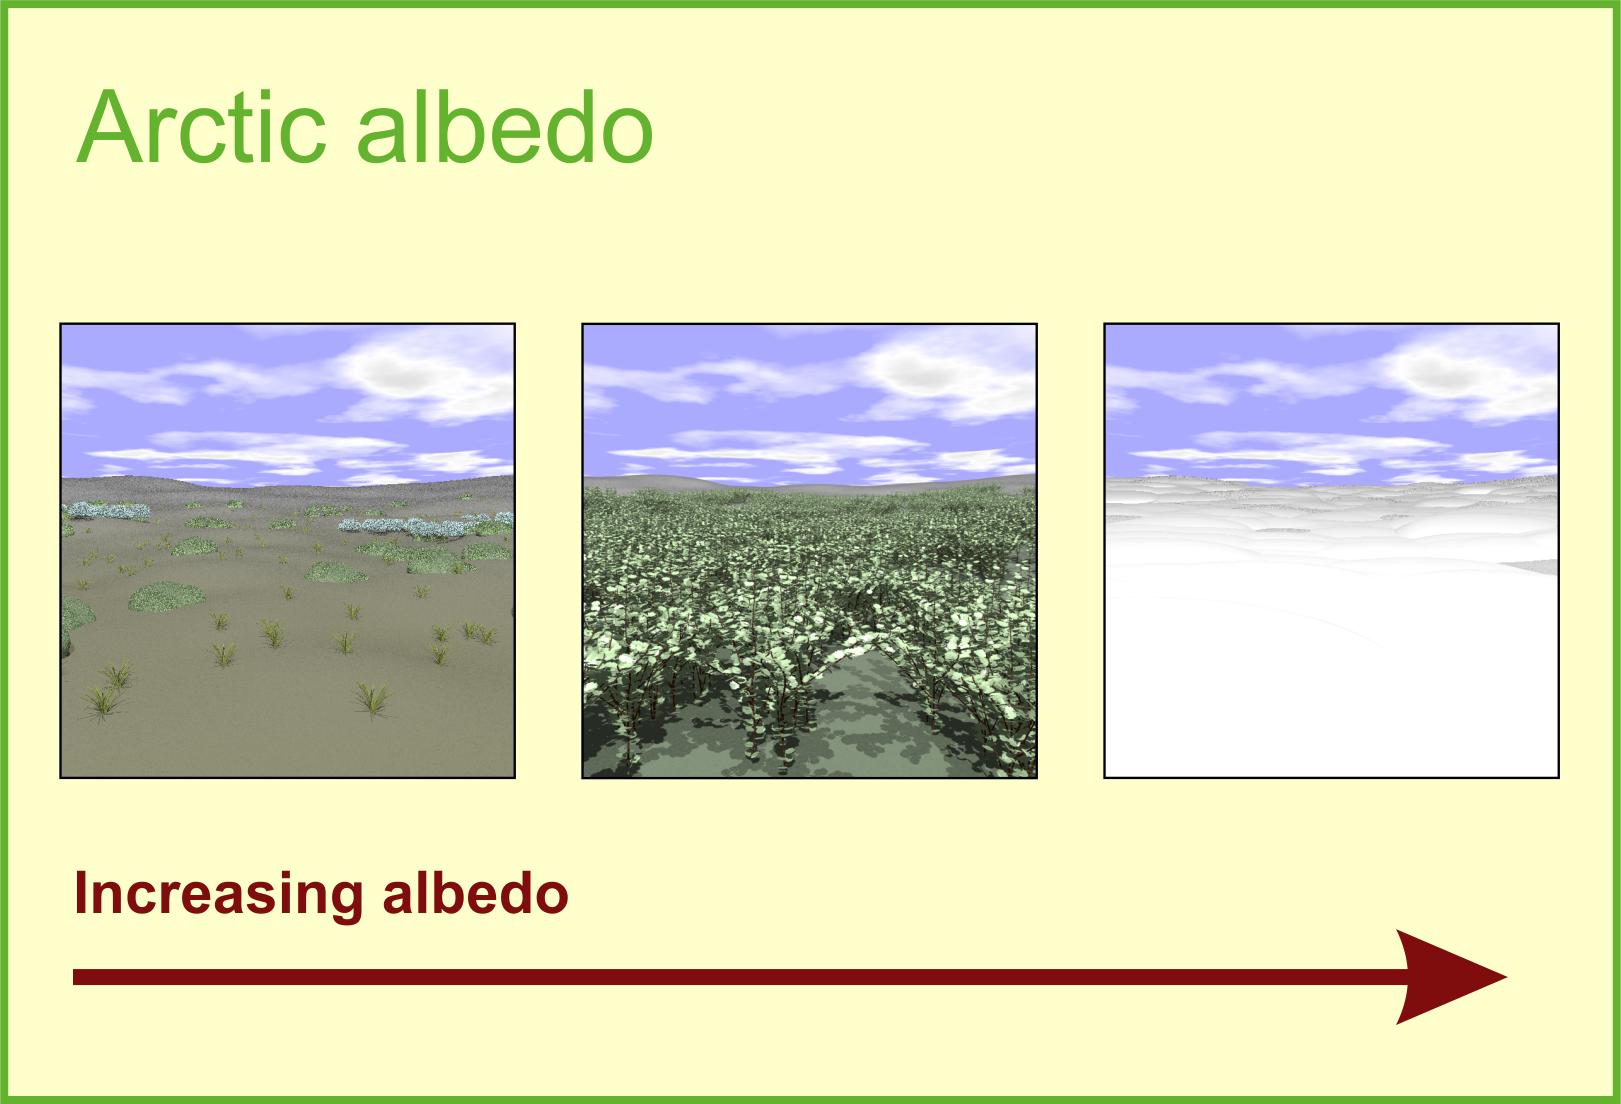 Arctic albedo